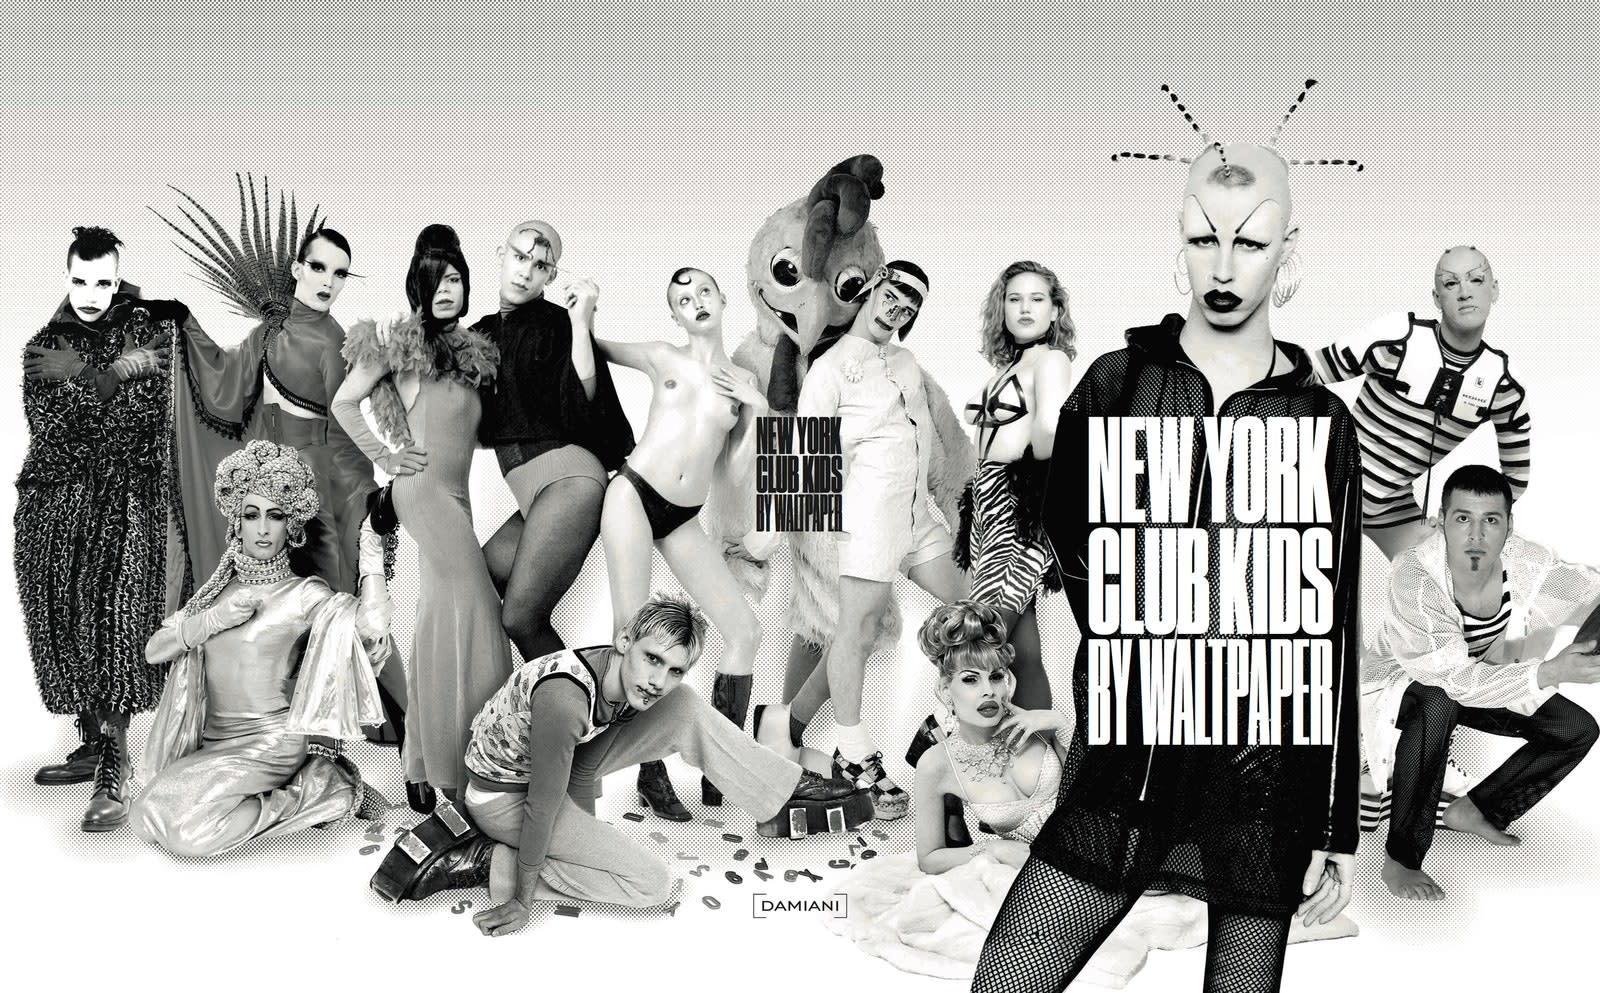 New York Club Kids by Walt Paper